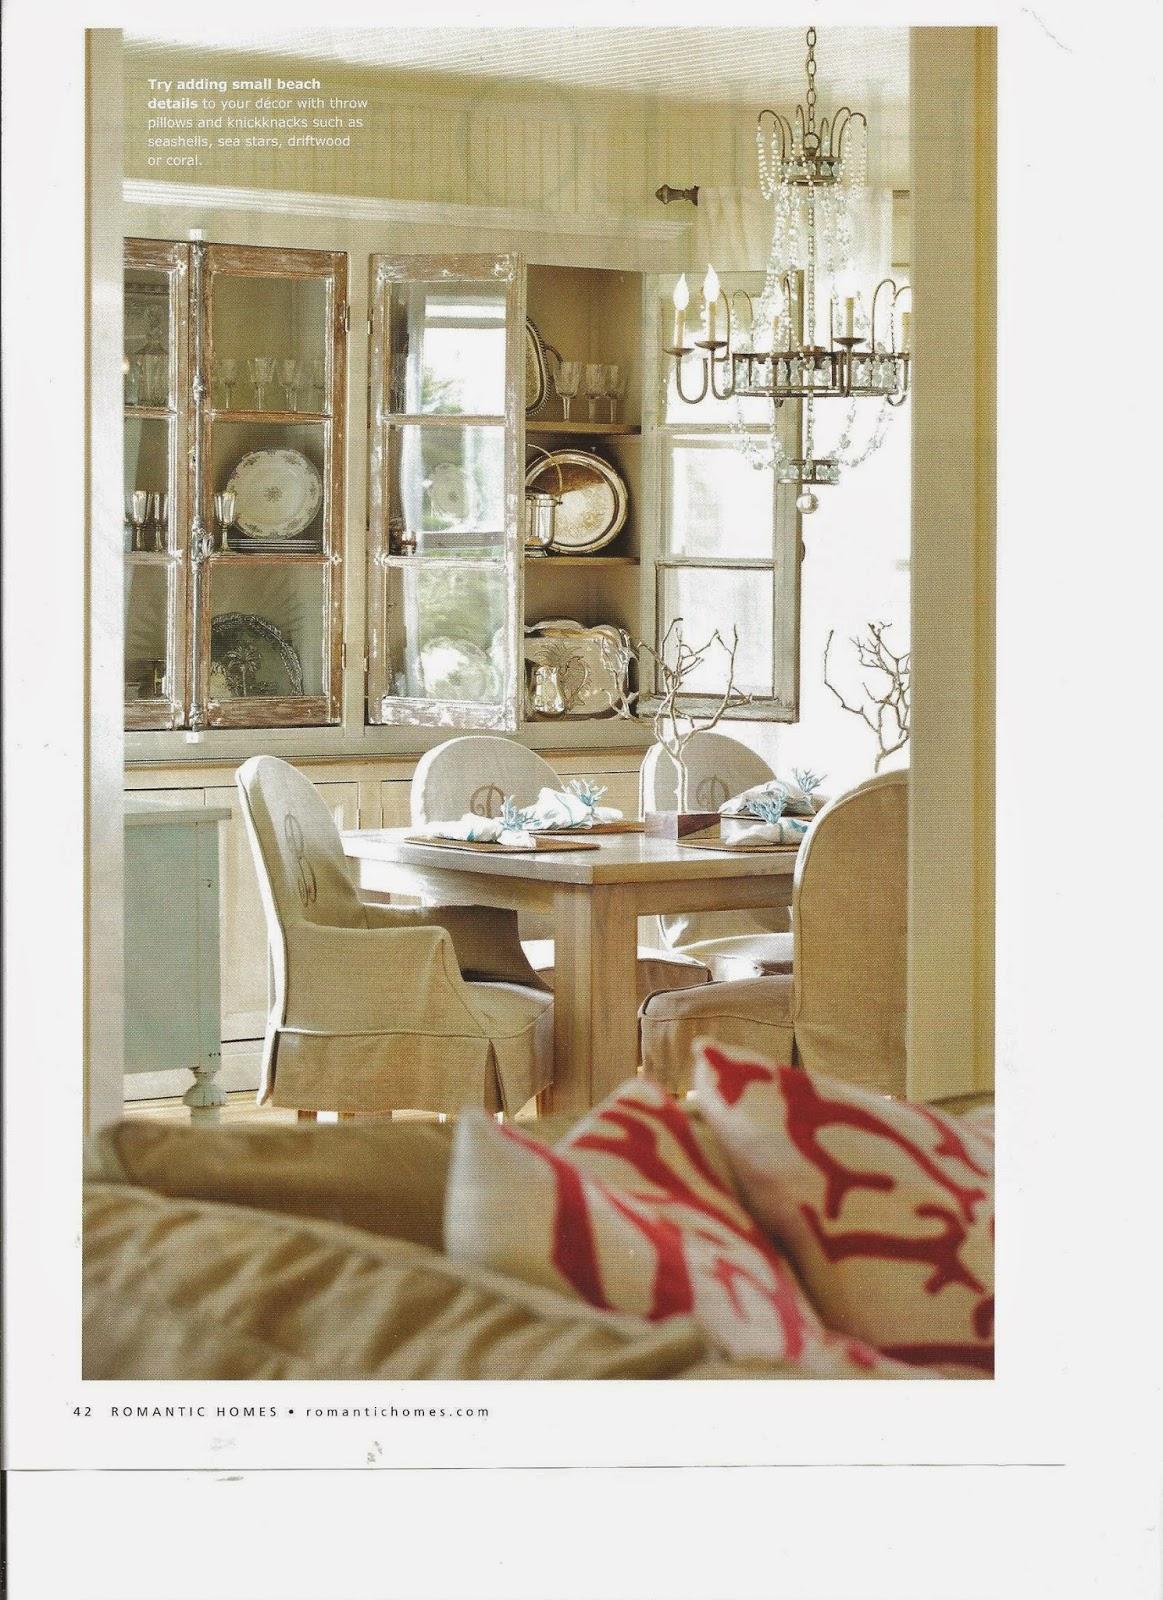 Jane Coslick Cottages My Favorite Bedroom And More: Jane Coslick Cottages : Romantic Homes